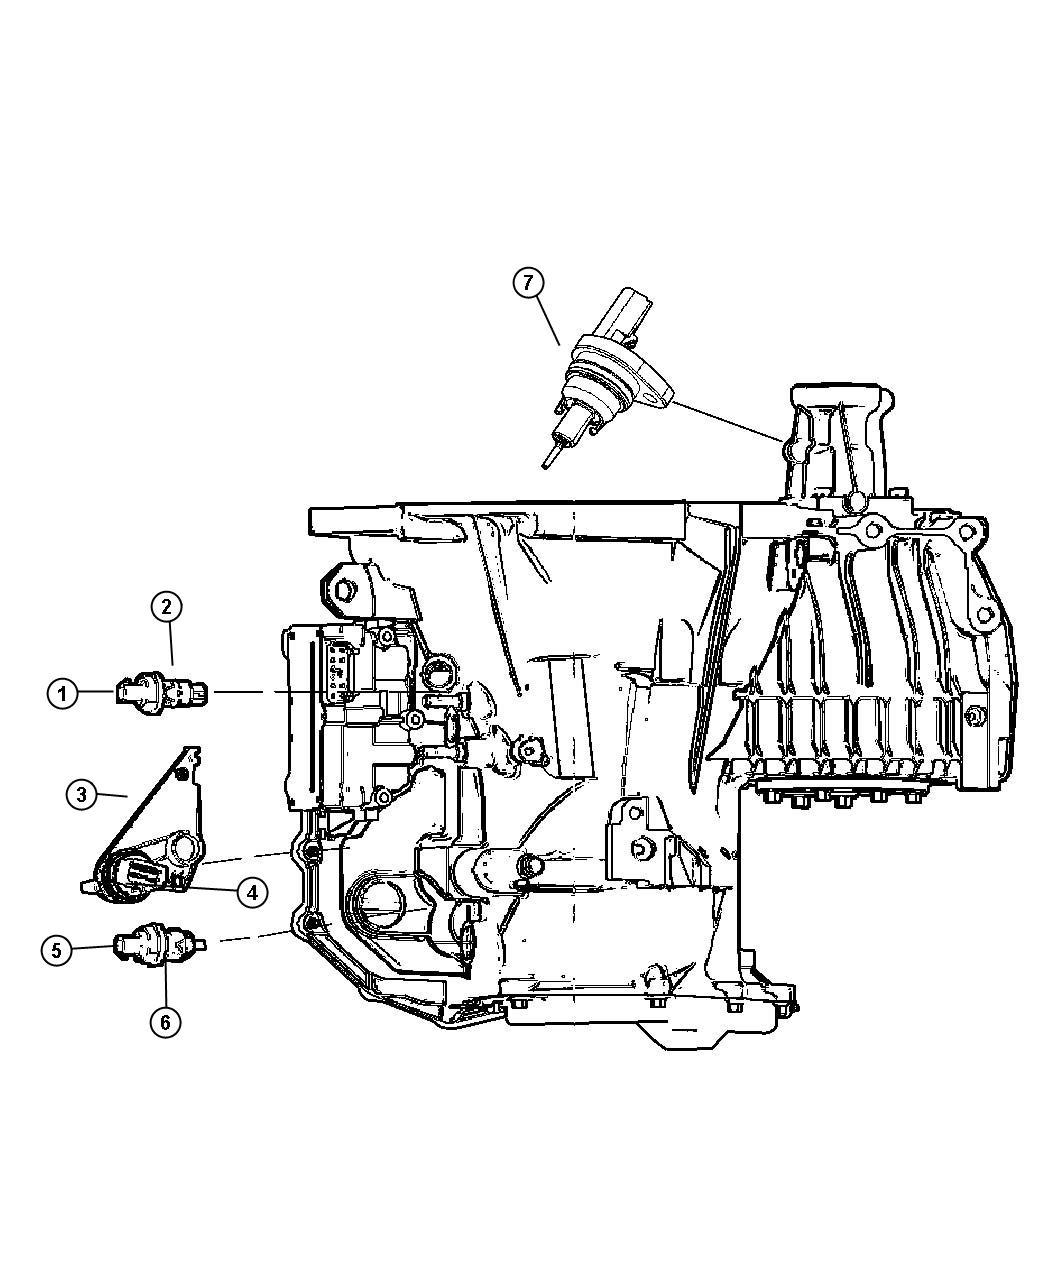 91 accord engine head diagram